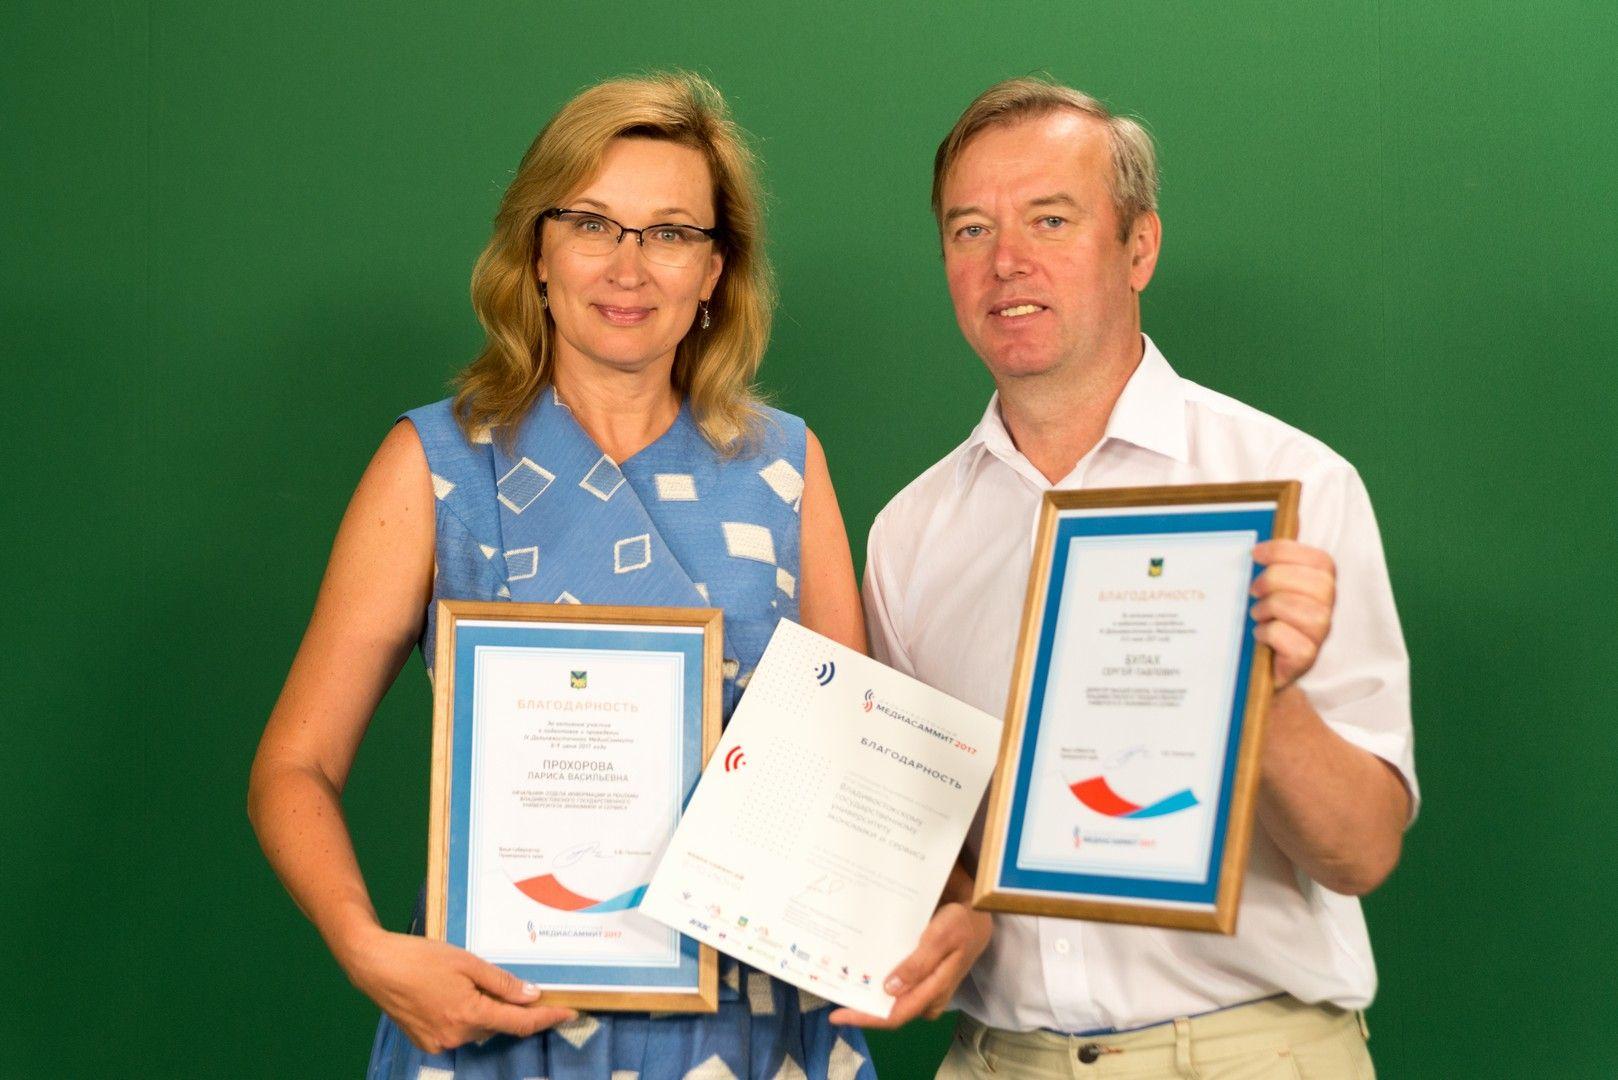 ВГУЭС наградили за активное участие в МедиаСаммите